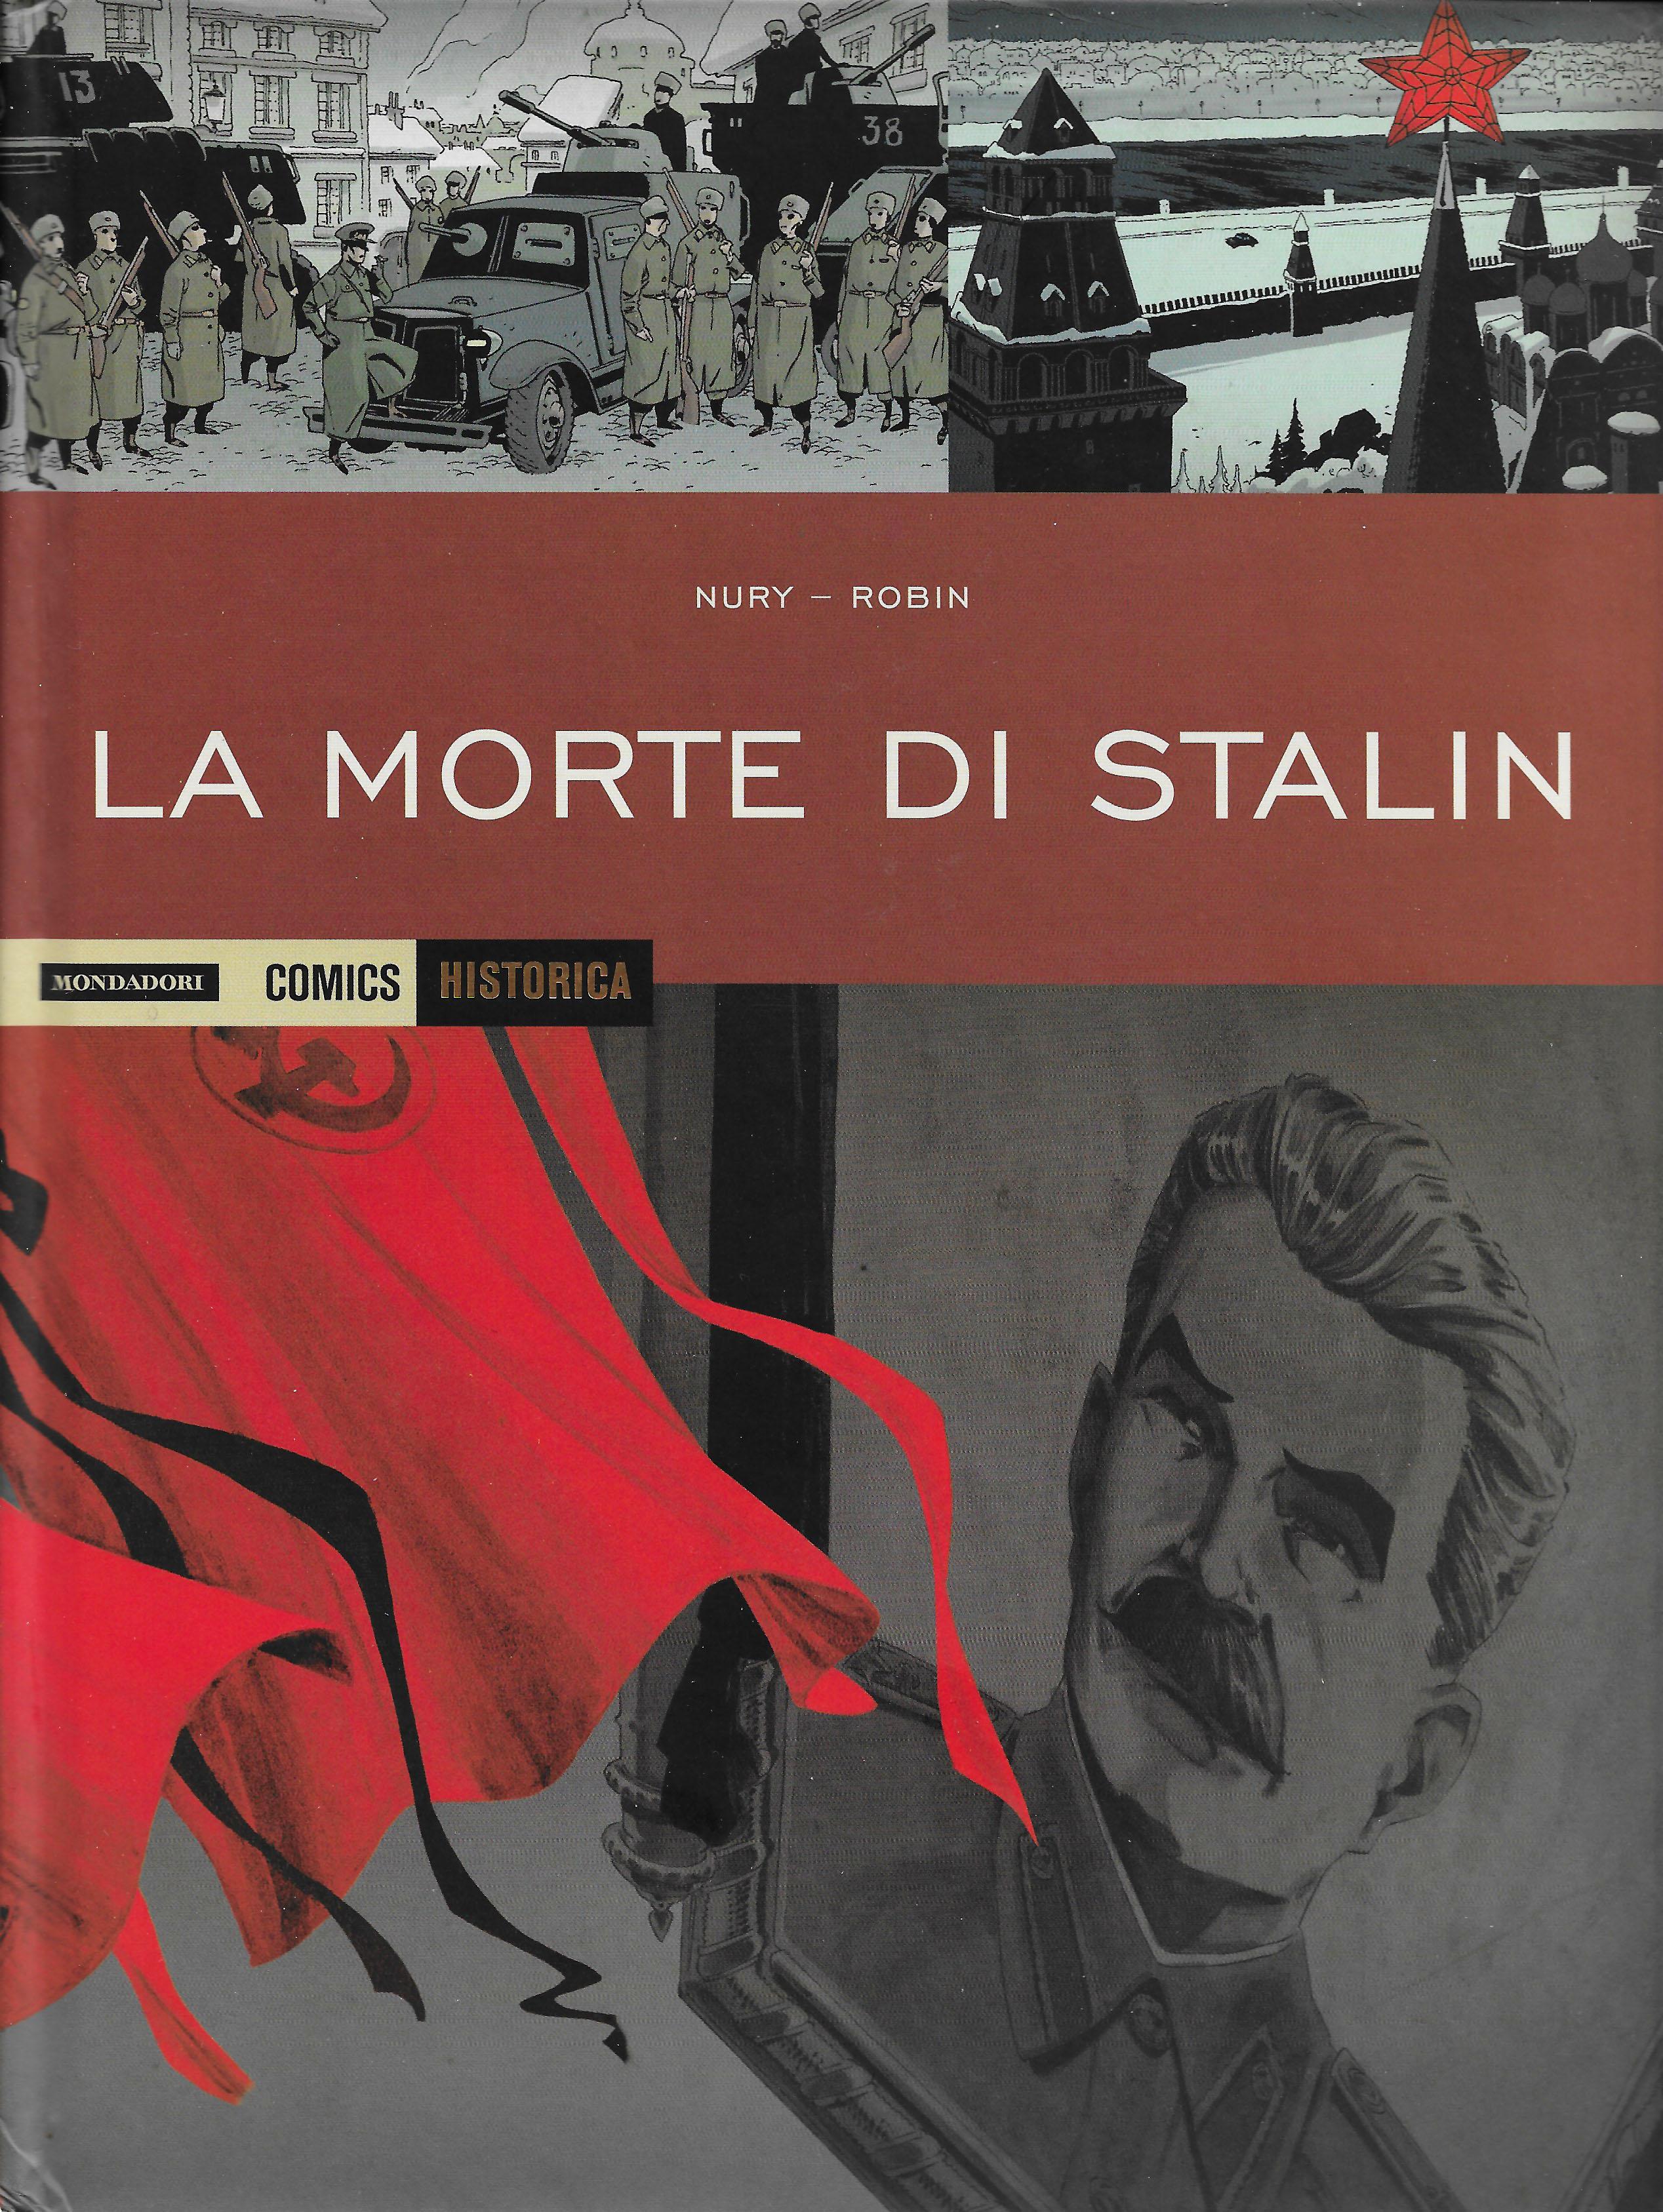 Fabien Nury, Thierry Robin, La morte di Stalin, Mondadori Comics